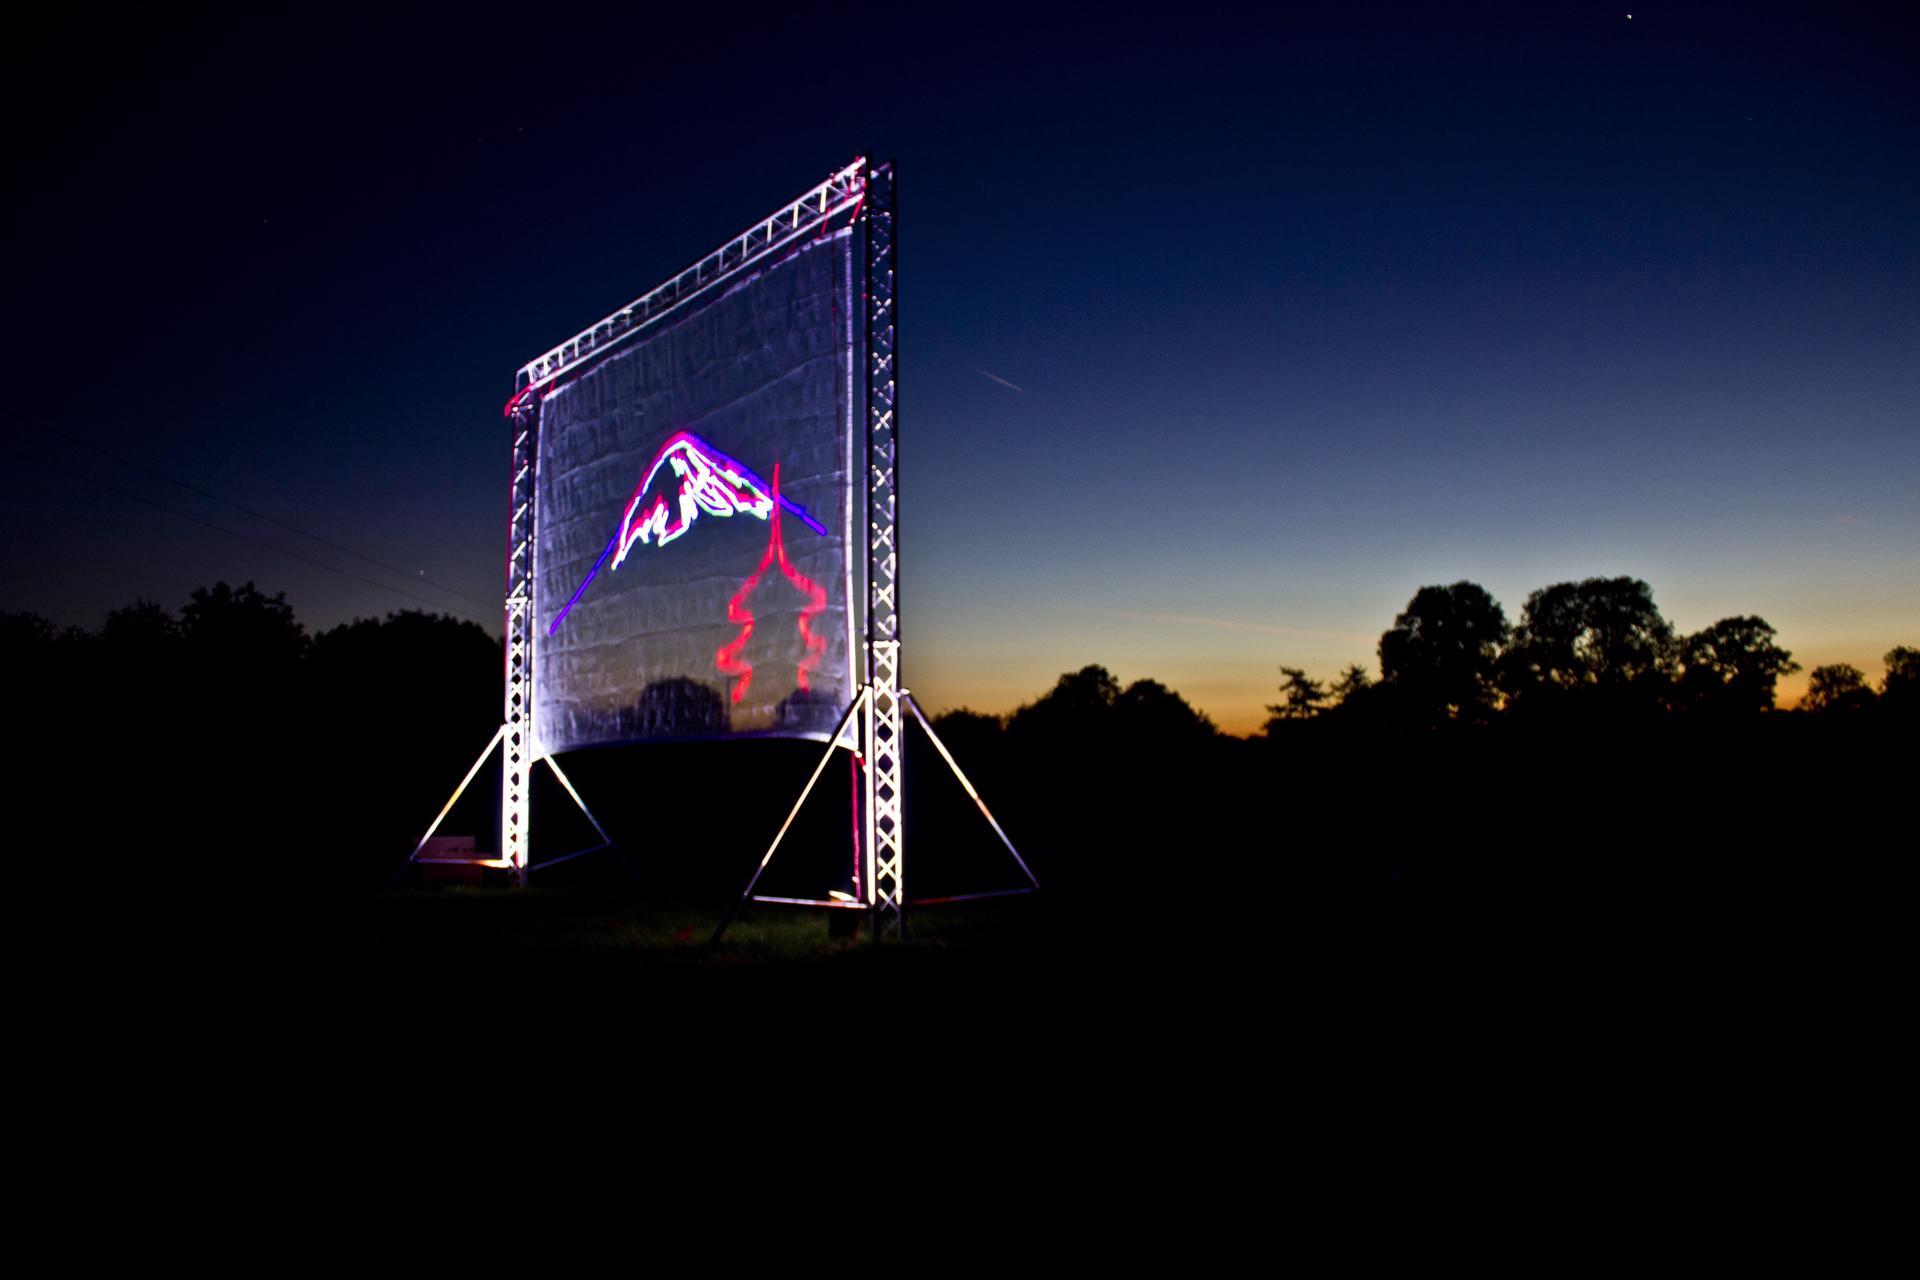 5m-high-laser-screen_21374146444_o-1920x1280.jpg